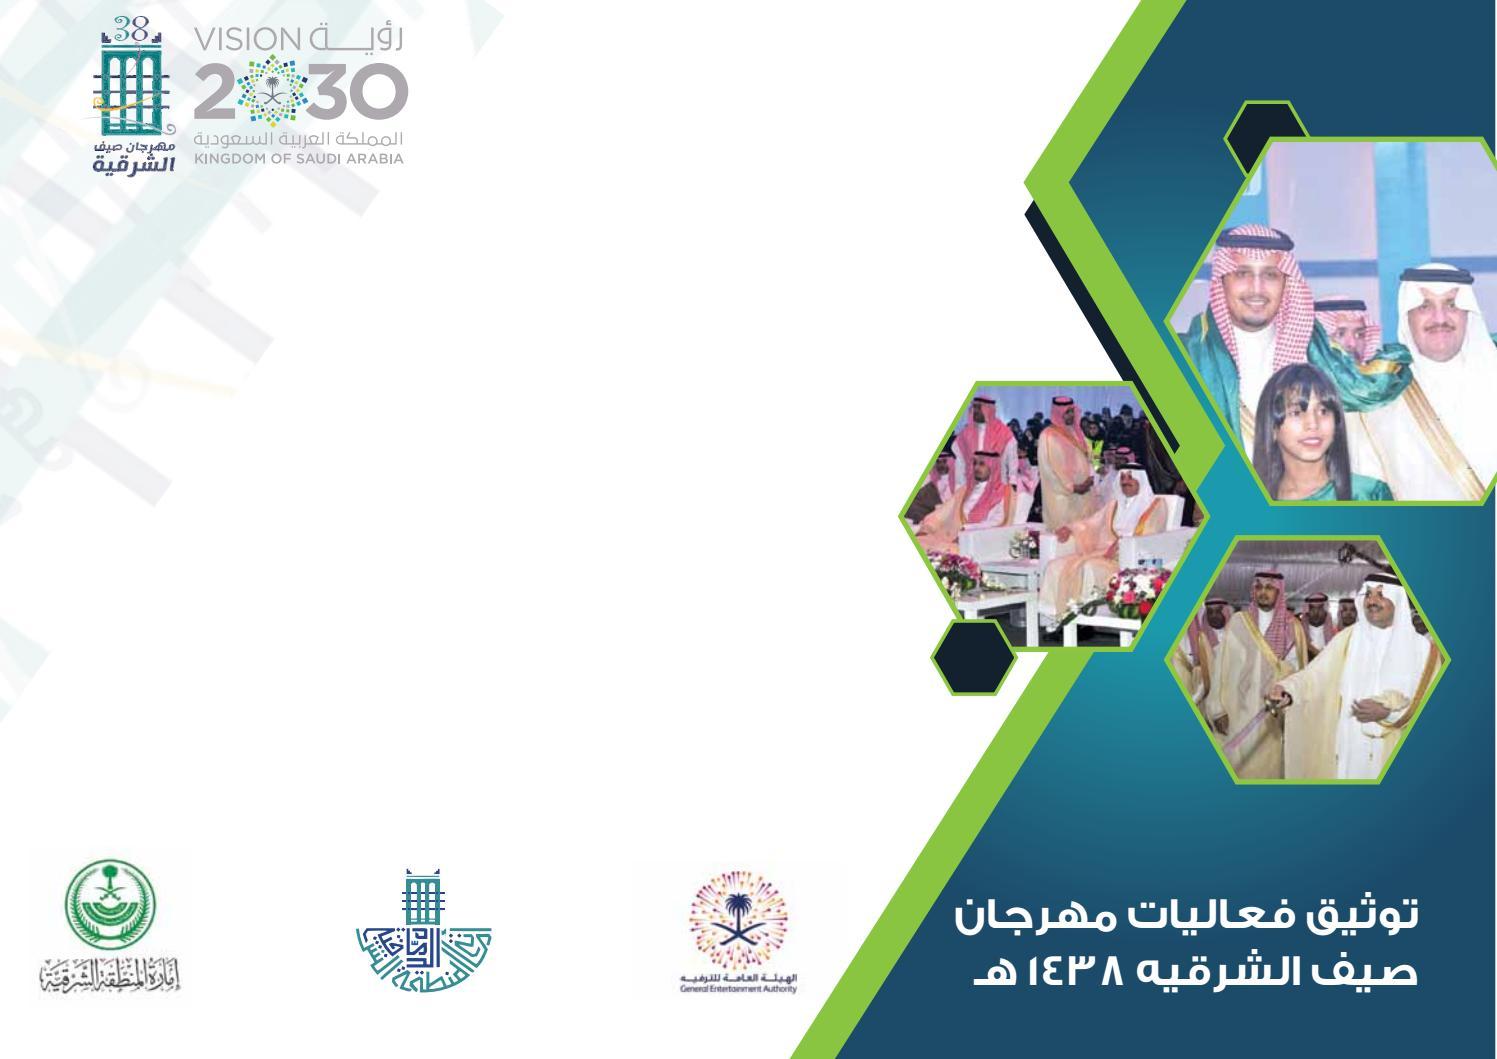 f18327cc8 فعاليات مهرجان صيف الشرقيه 201701 by Ahmed Elgendy - issuu